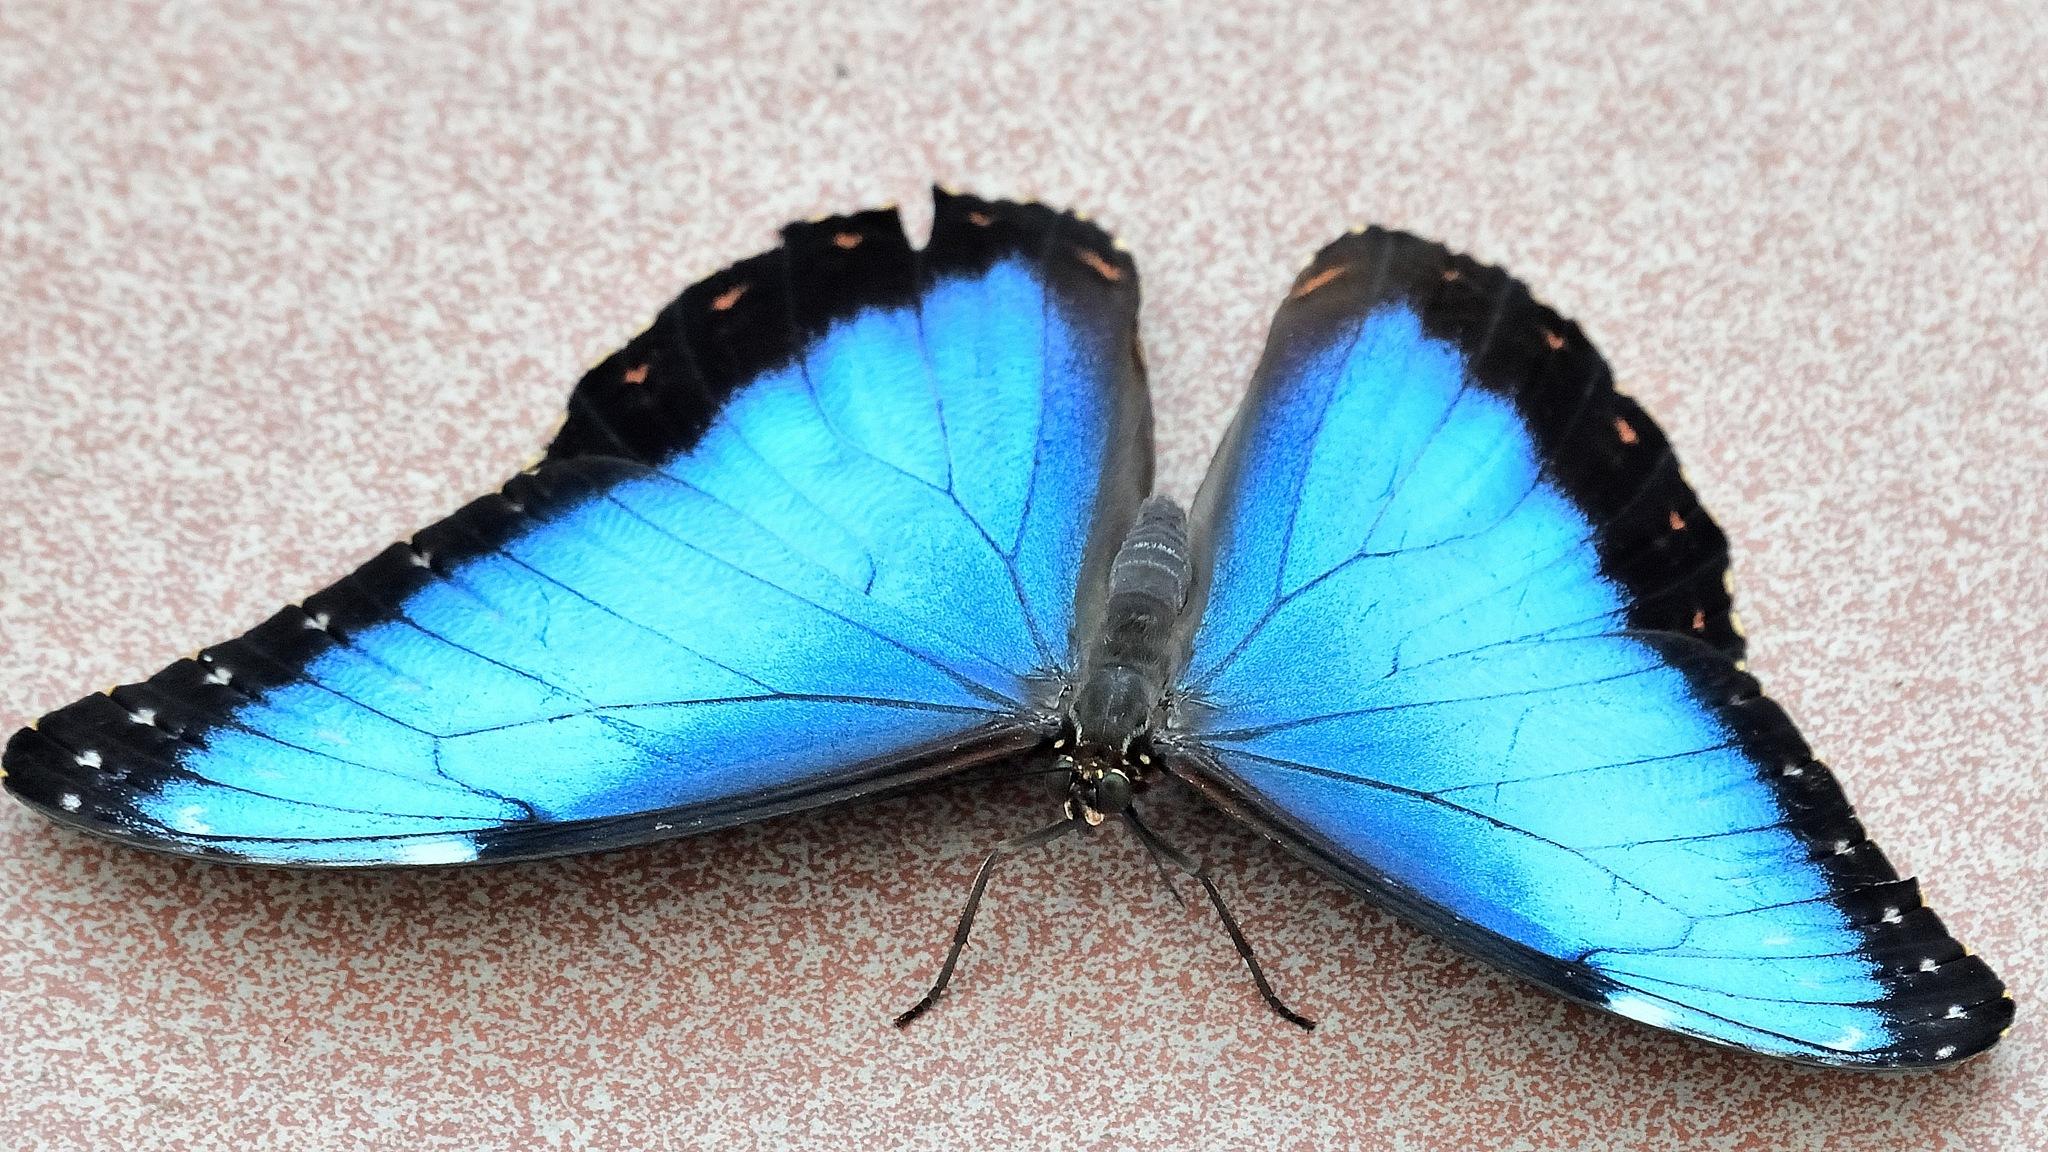 Morpho bleu Blue Morpho by Georges Pilotte